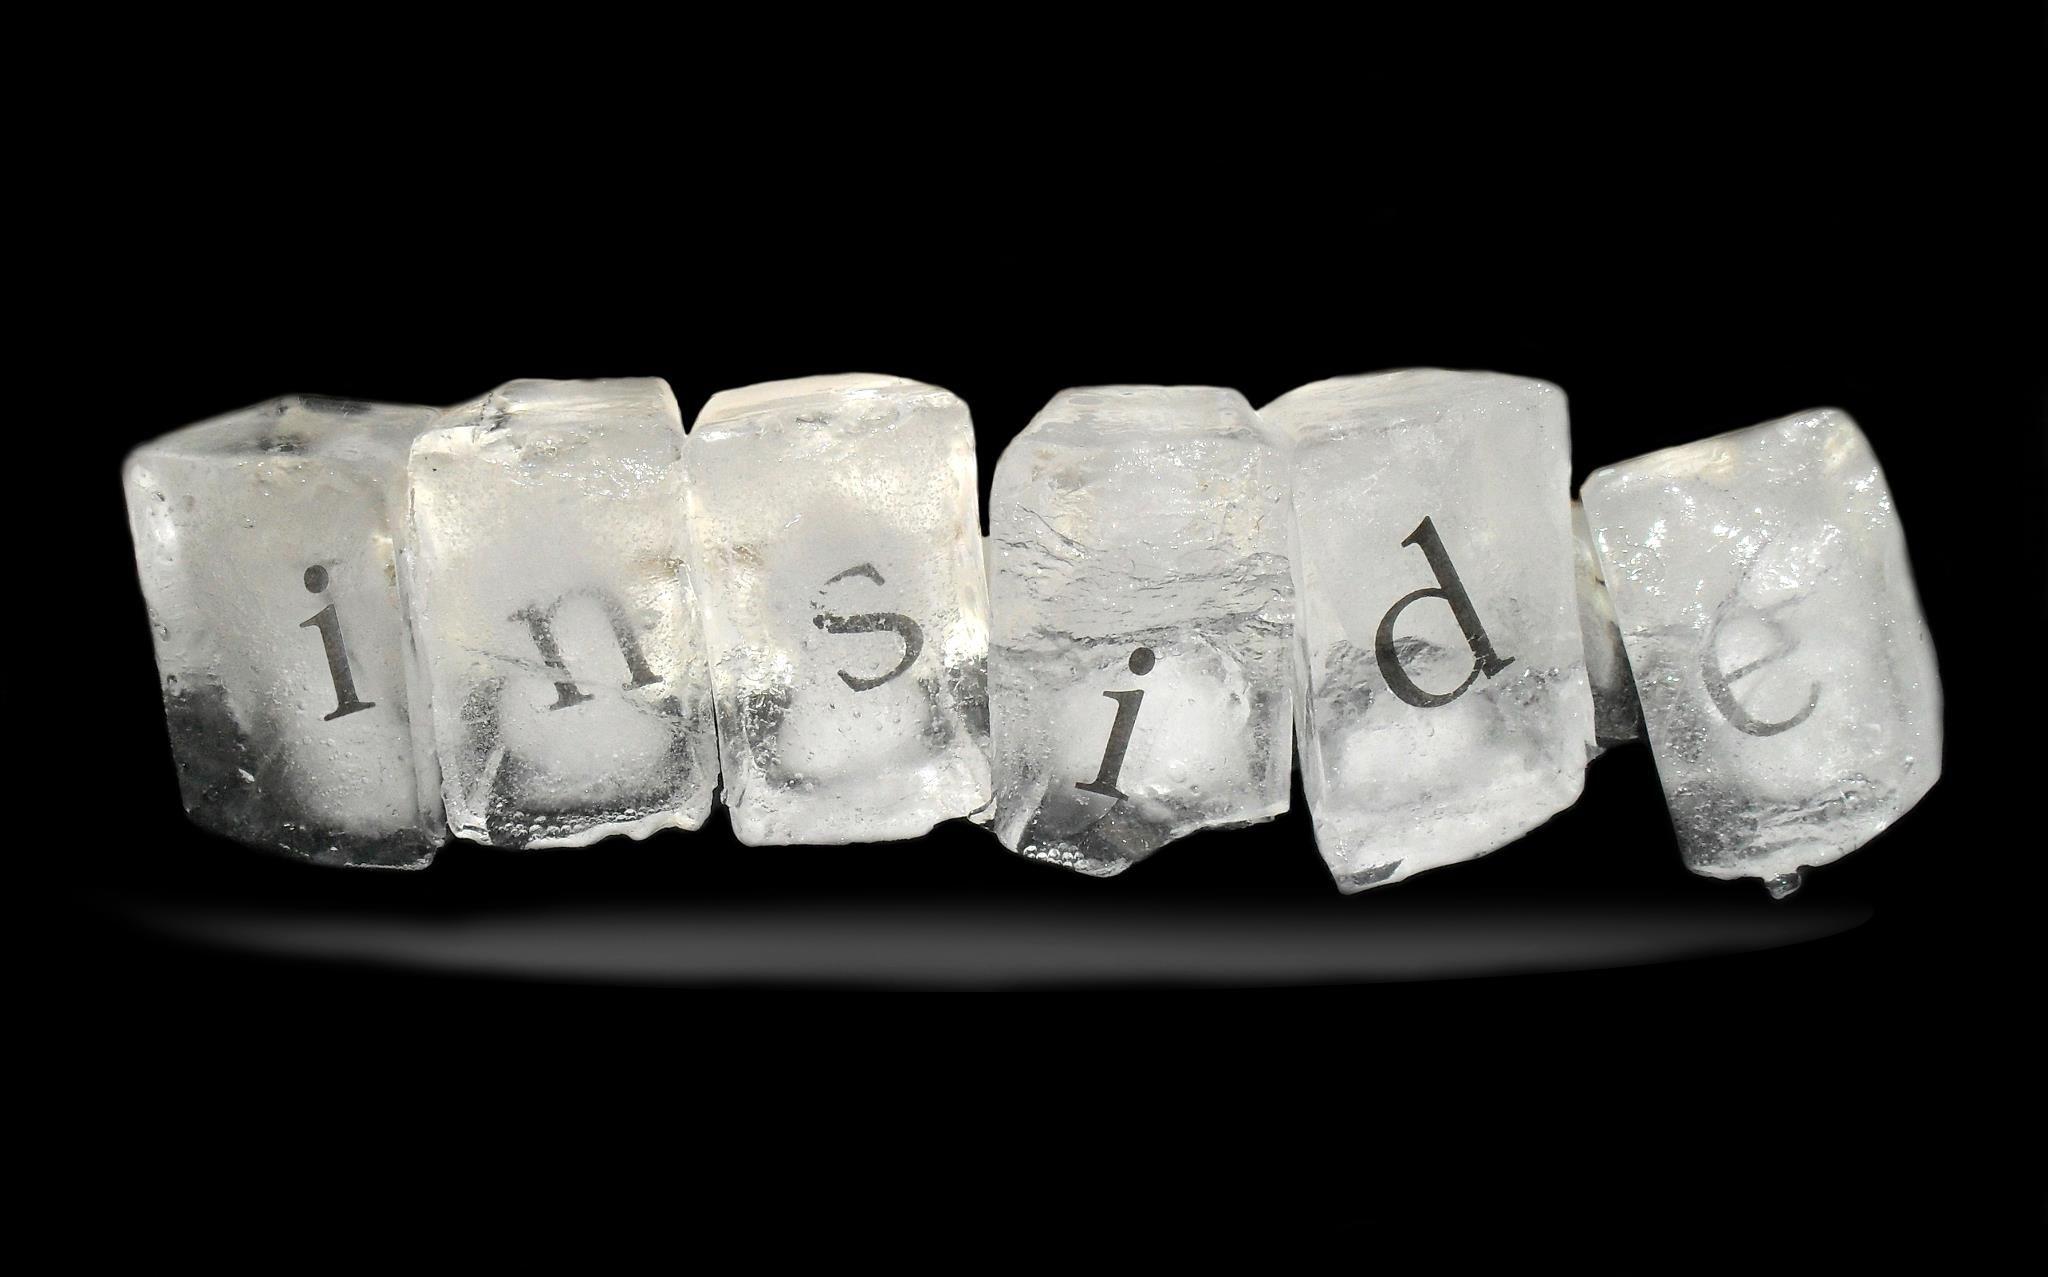 Three dimensional ice typography.